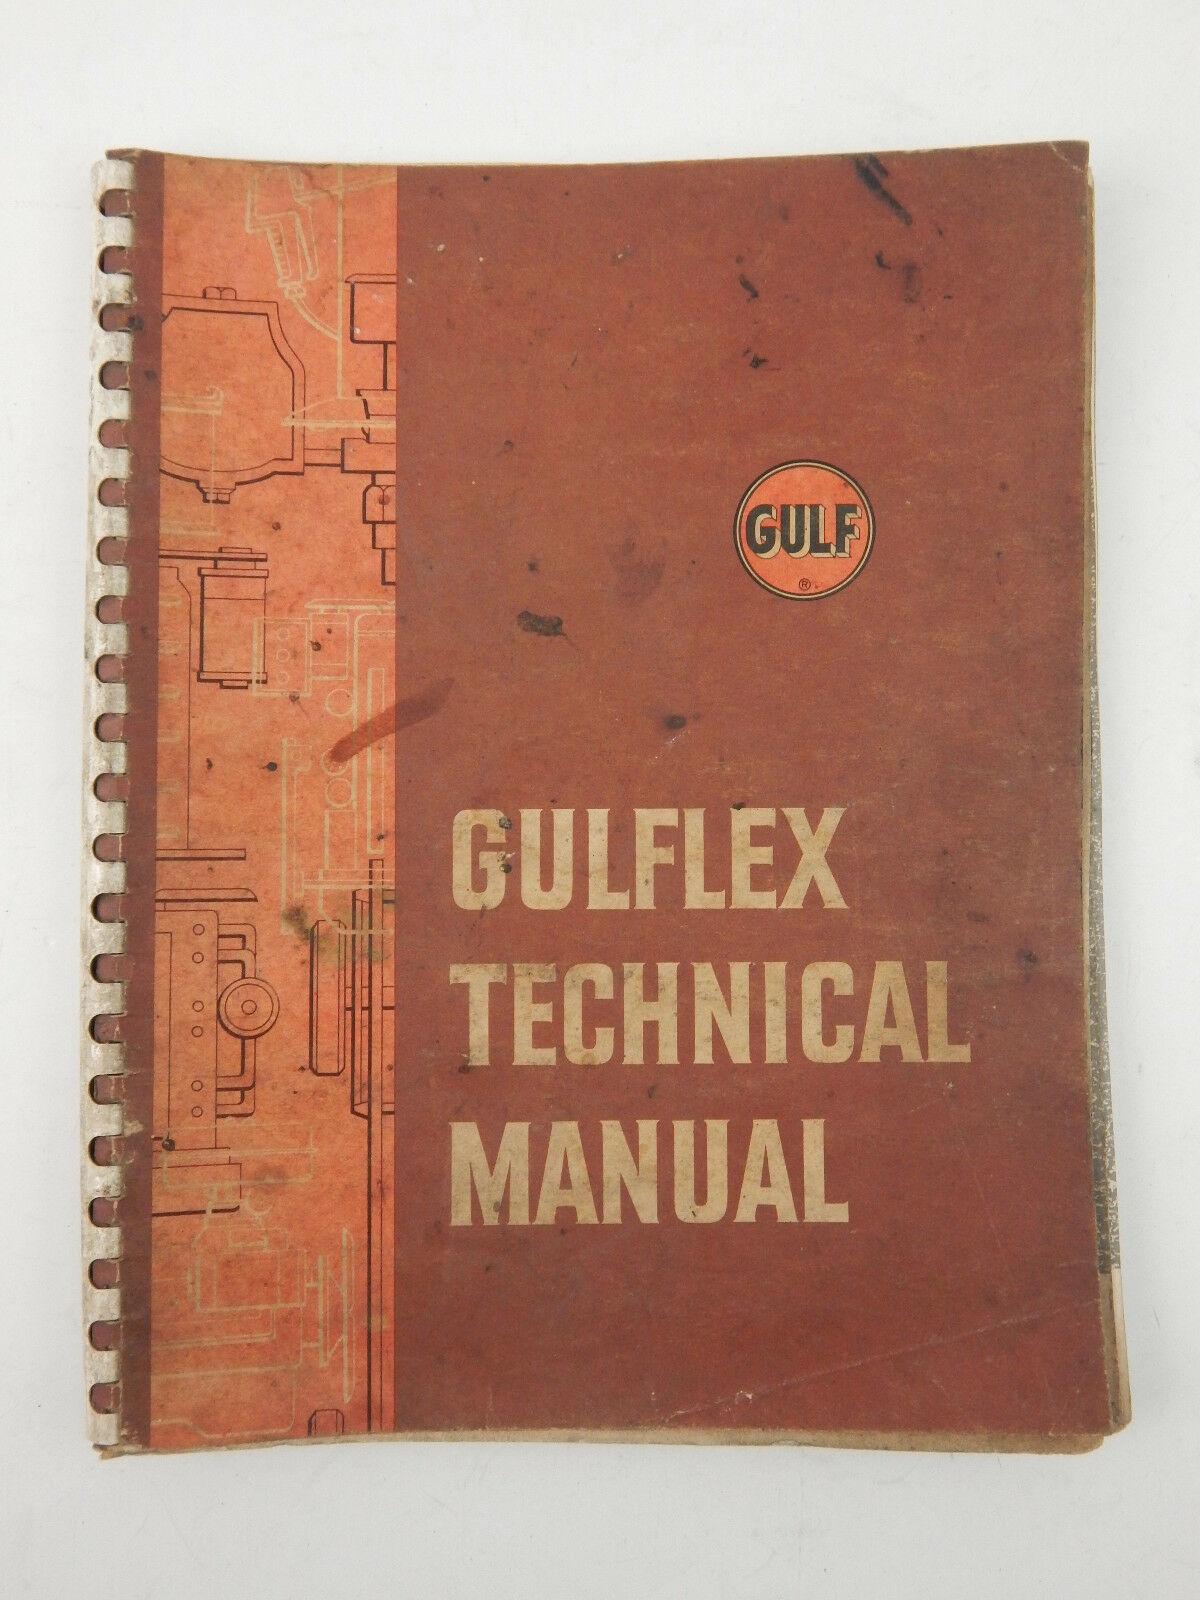 VINTAGE GULF 1959 GULFLEX TECHNICAL MANUAL COMPLETE - $15.48